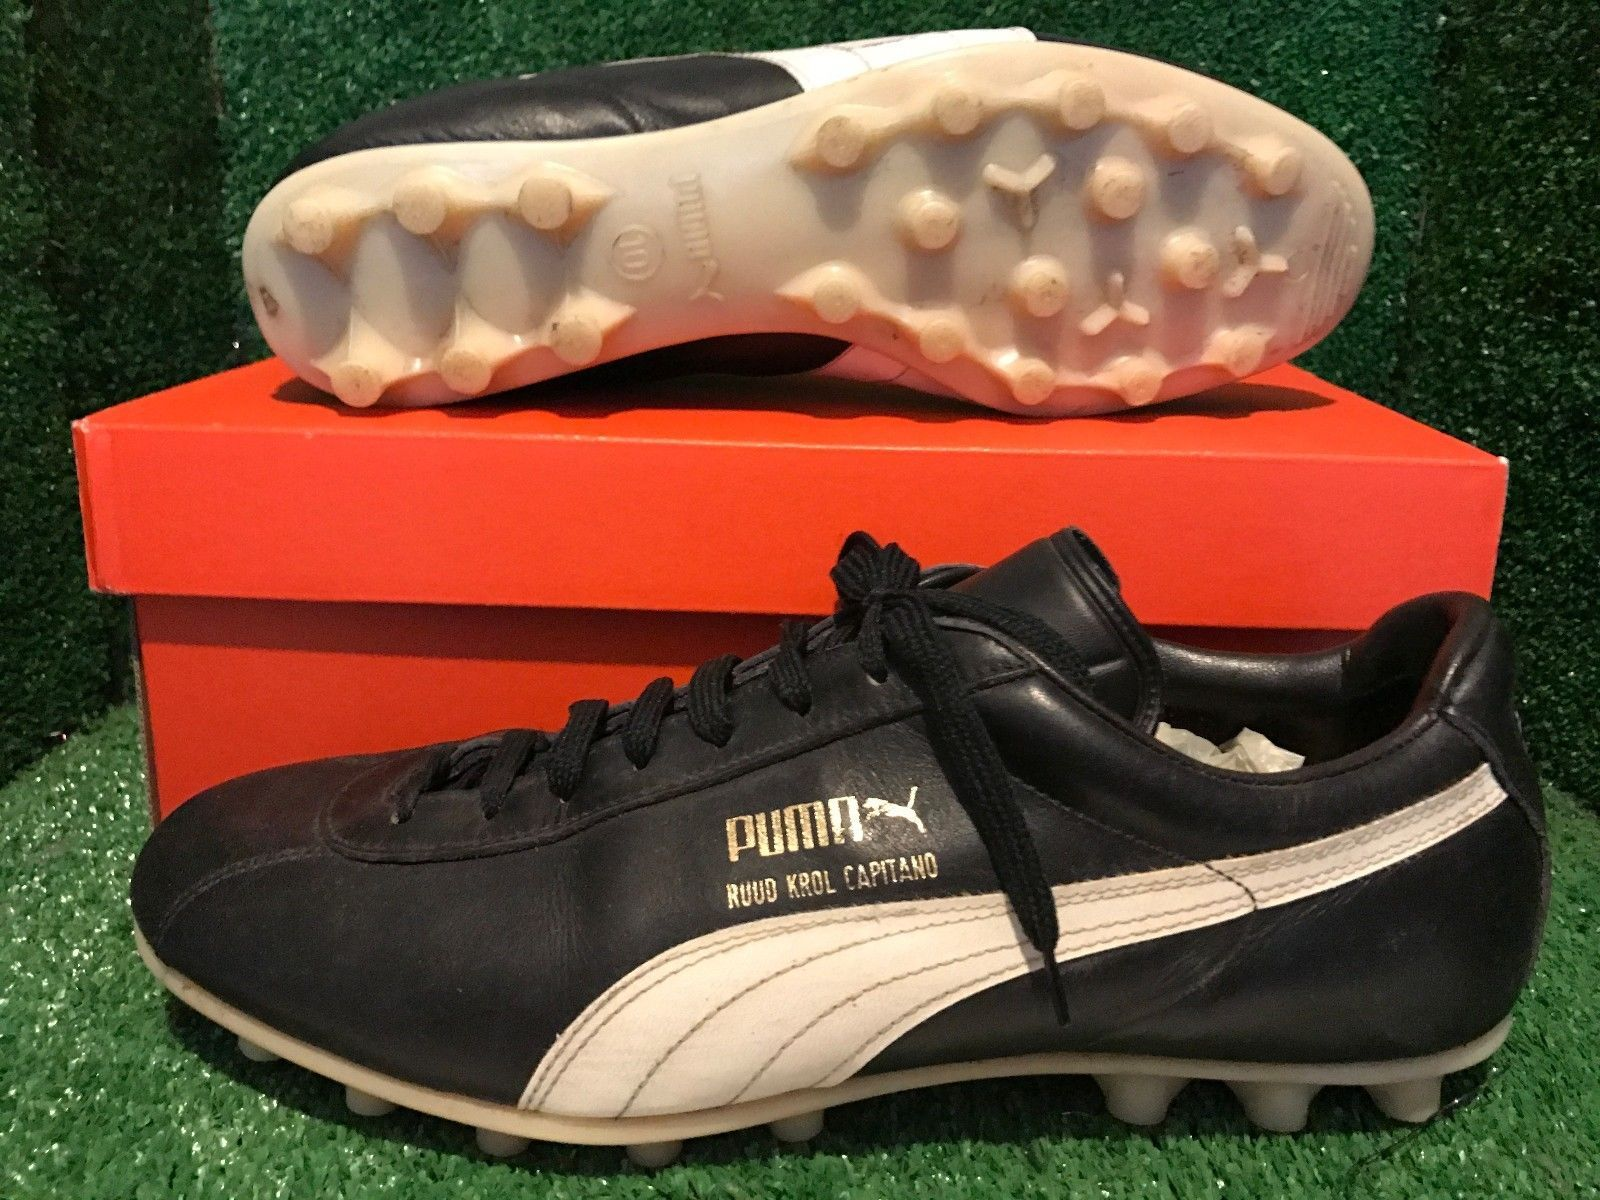 Puma Maradona | Puma football boots, Cool football boots